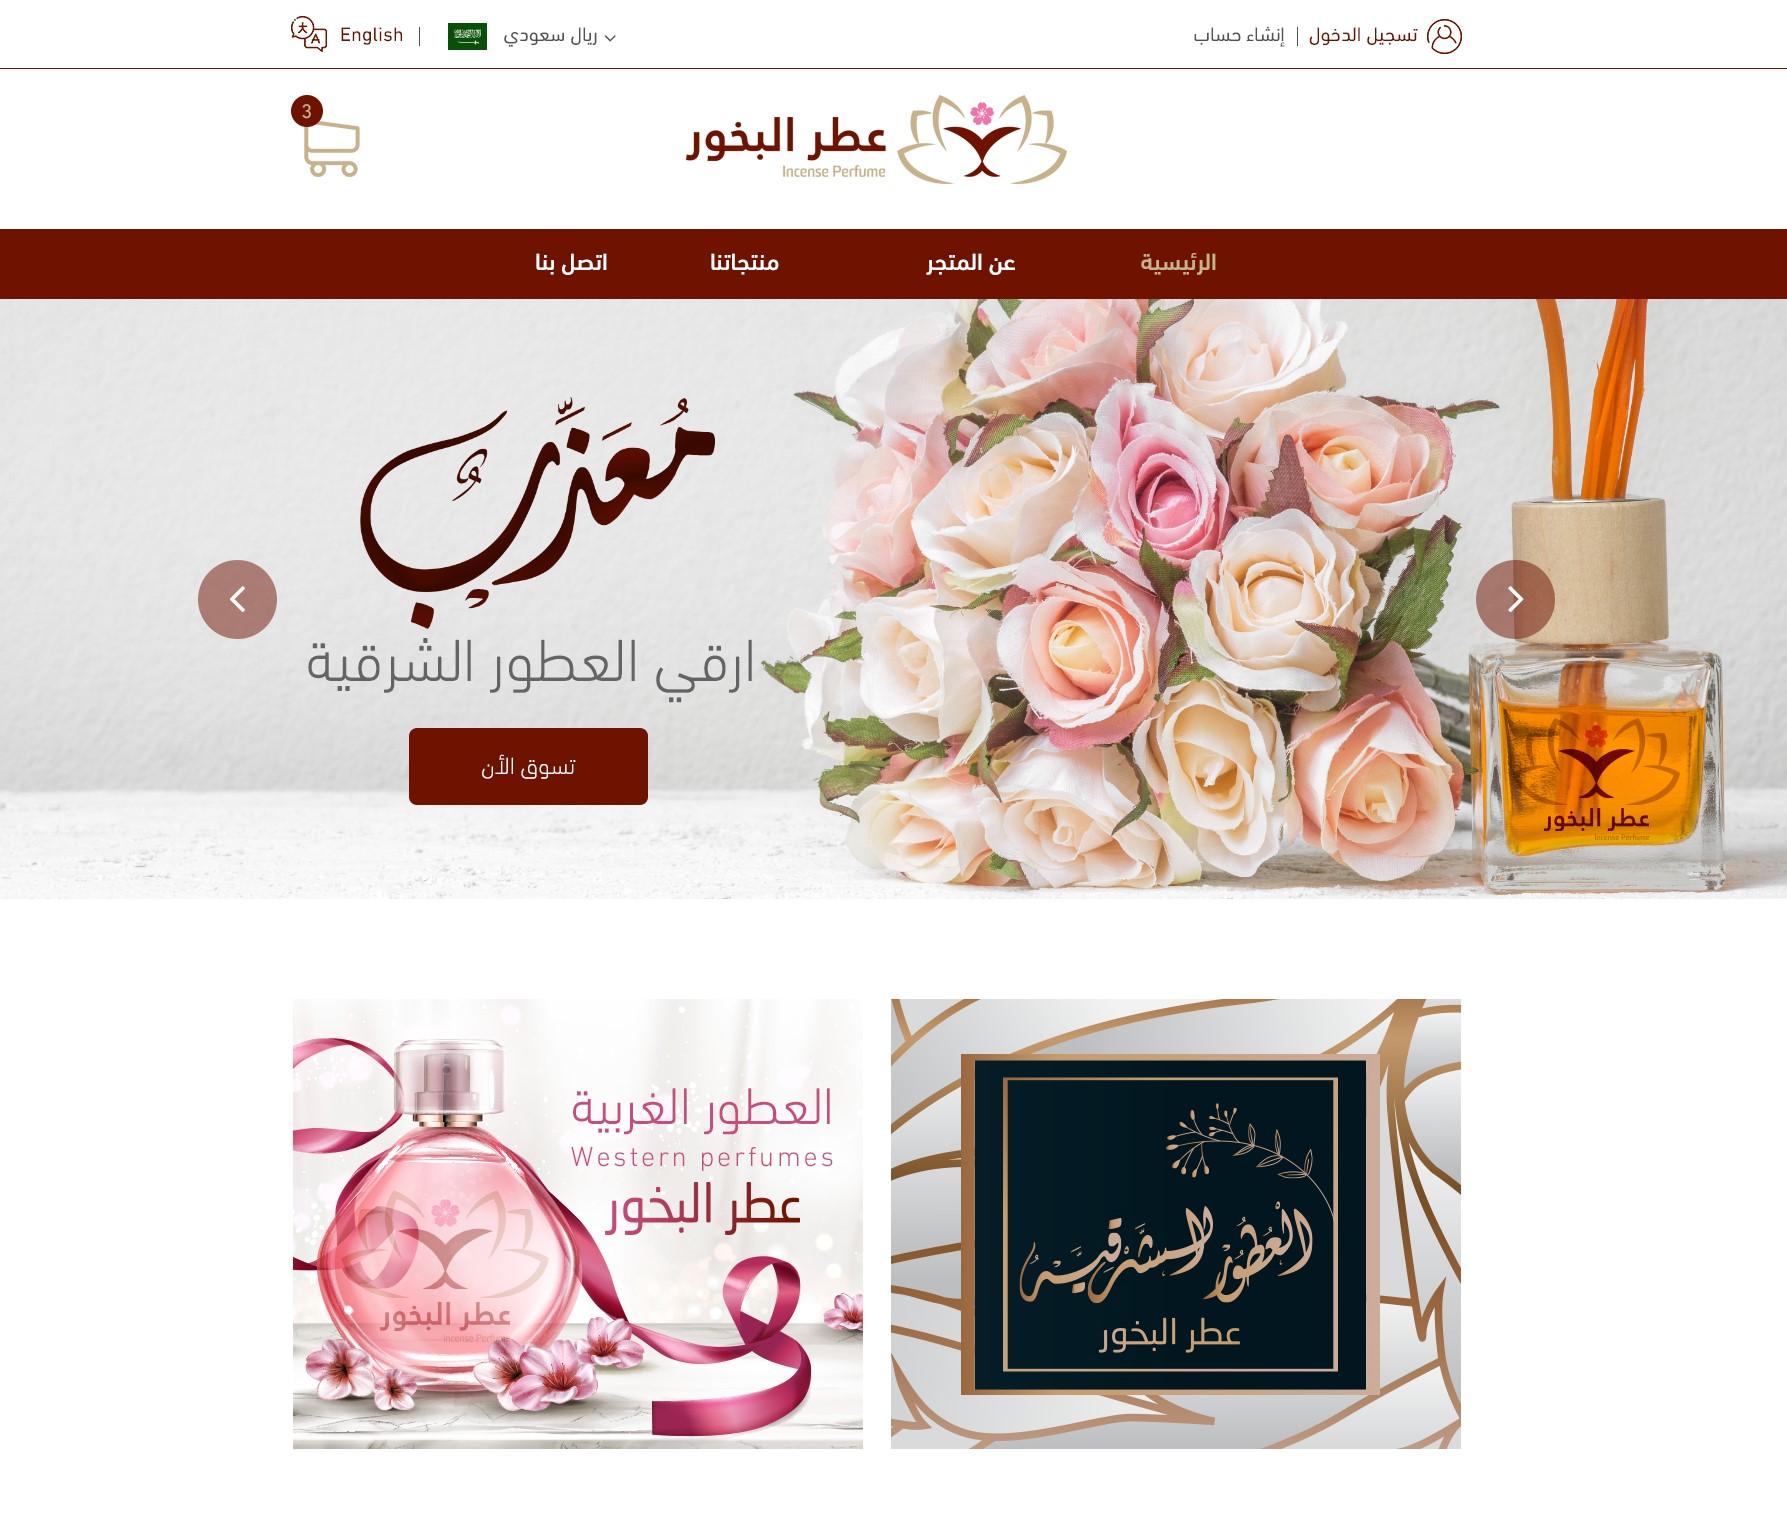 Incense perfume shop